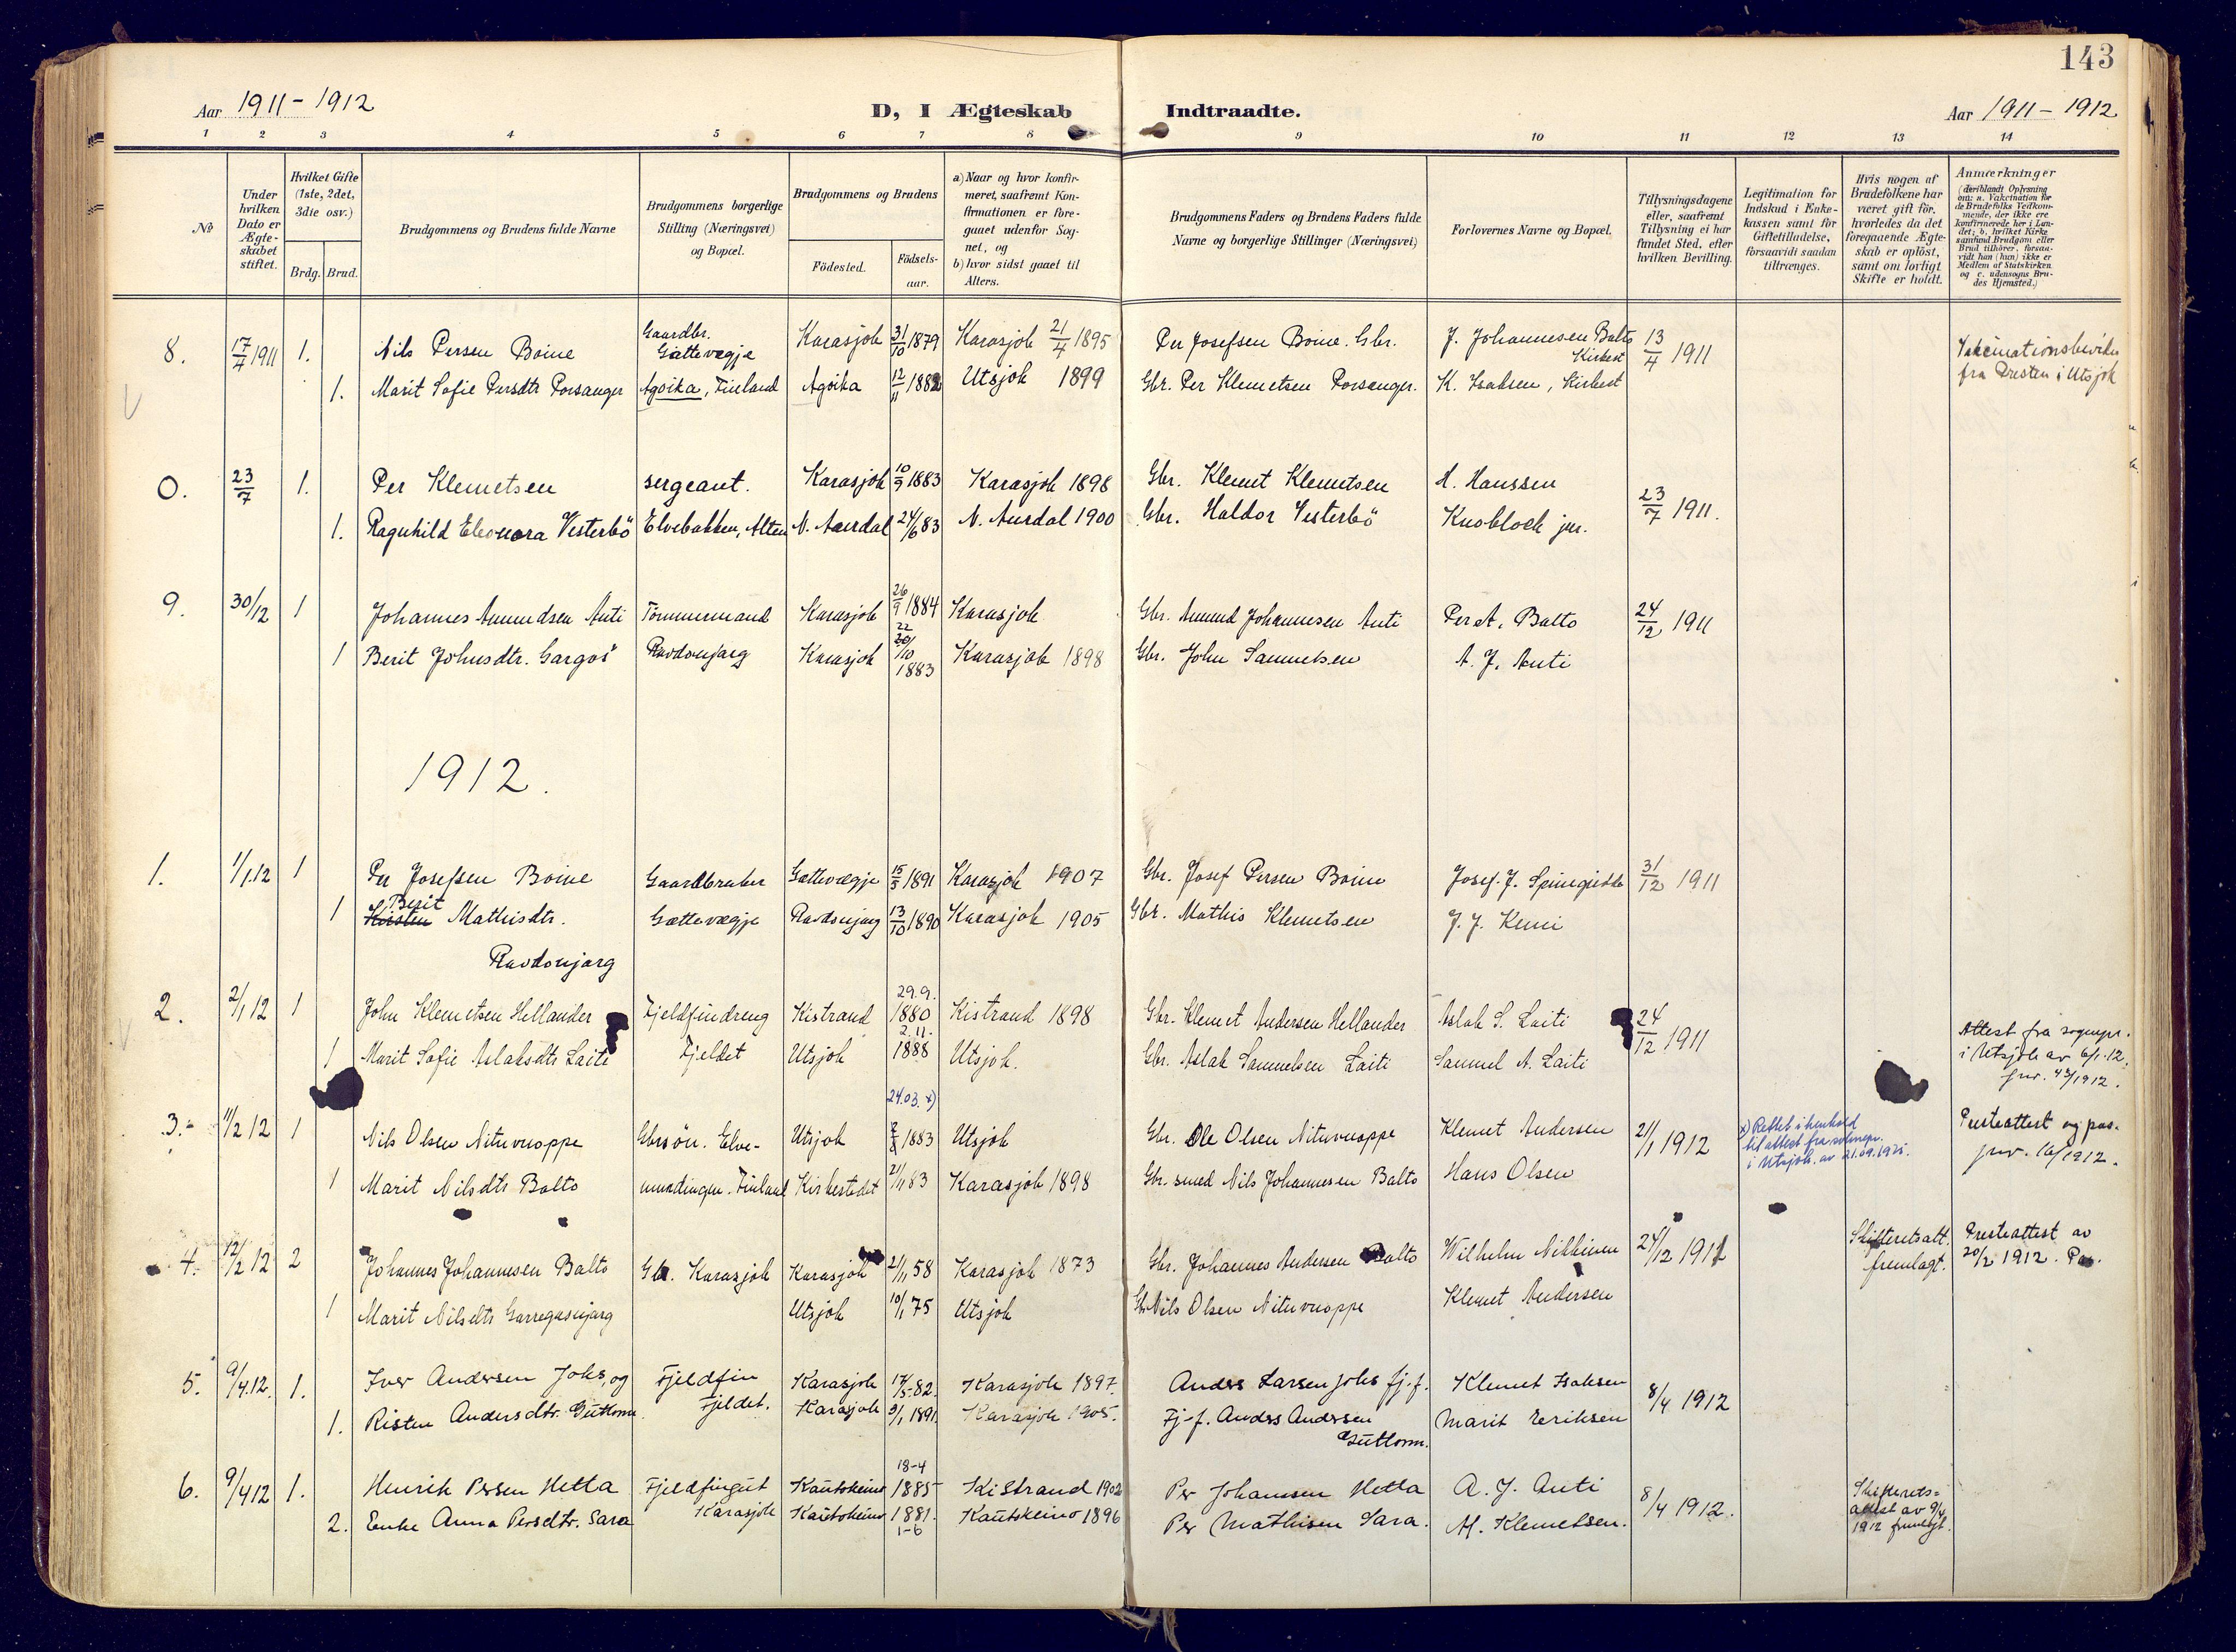 SATØ, Karasjok sokneprestkontor, H/Ha: Ministerialbok nr. 3, 1907-1926, s. 143